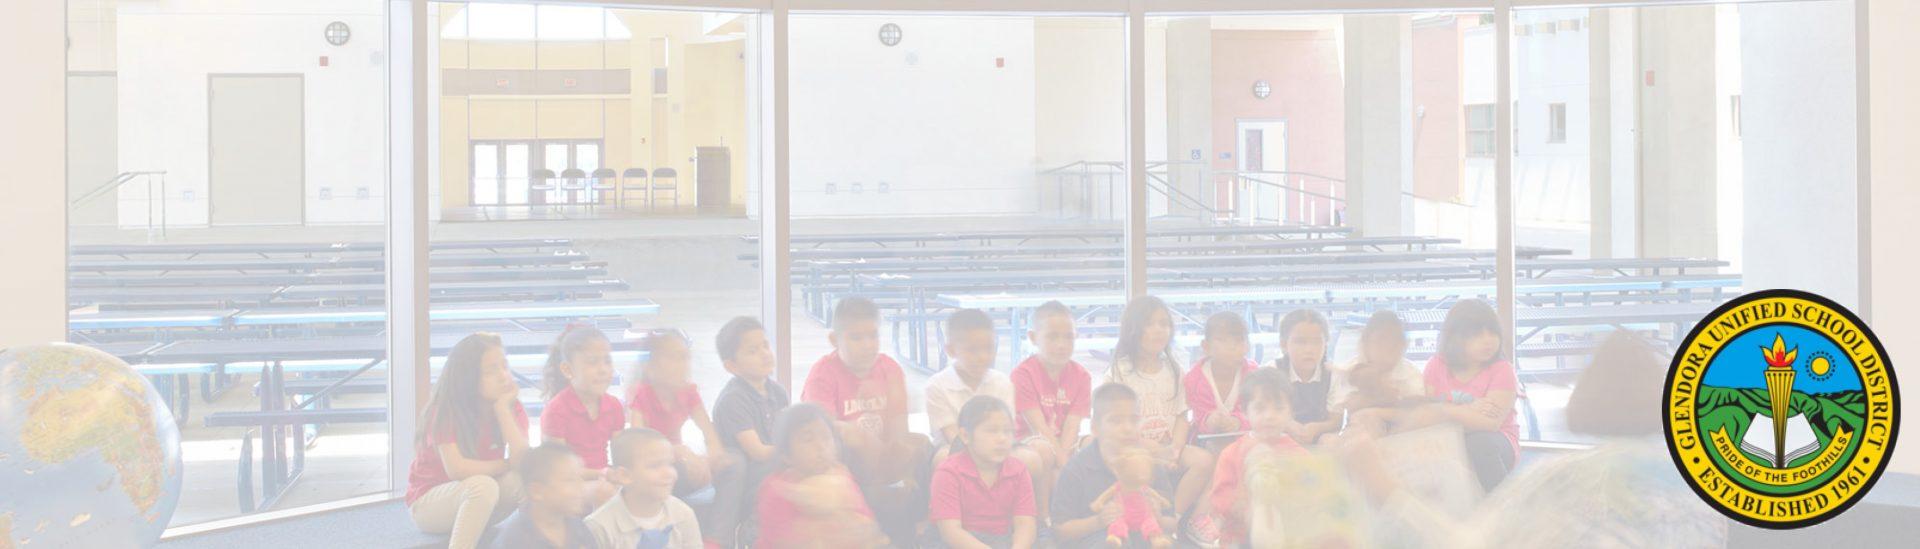 Glendora Unified School District Facilities Assessments